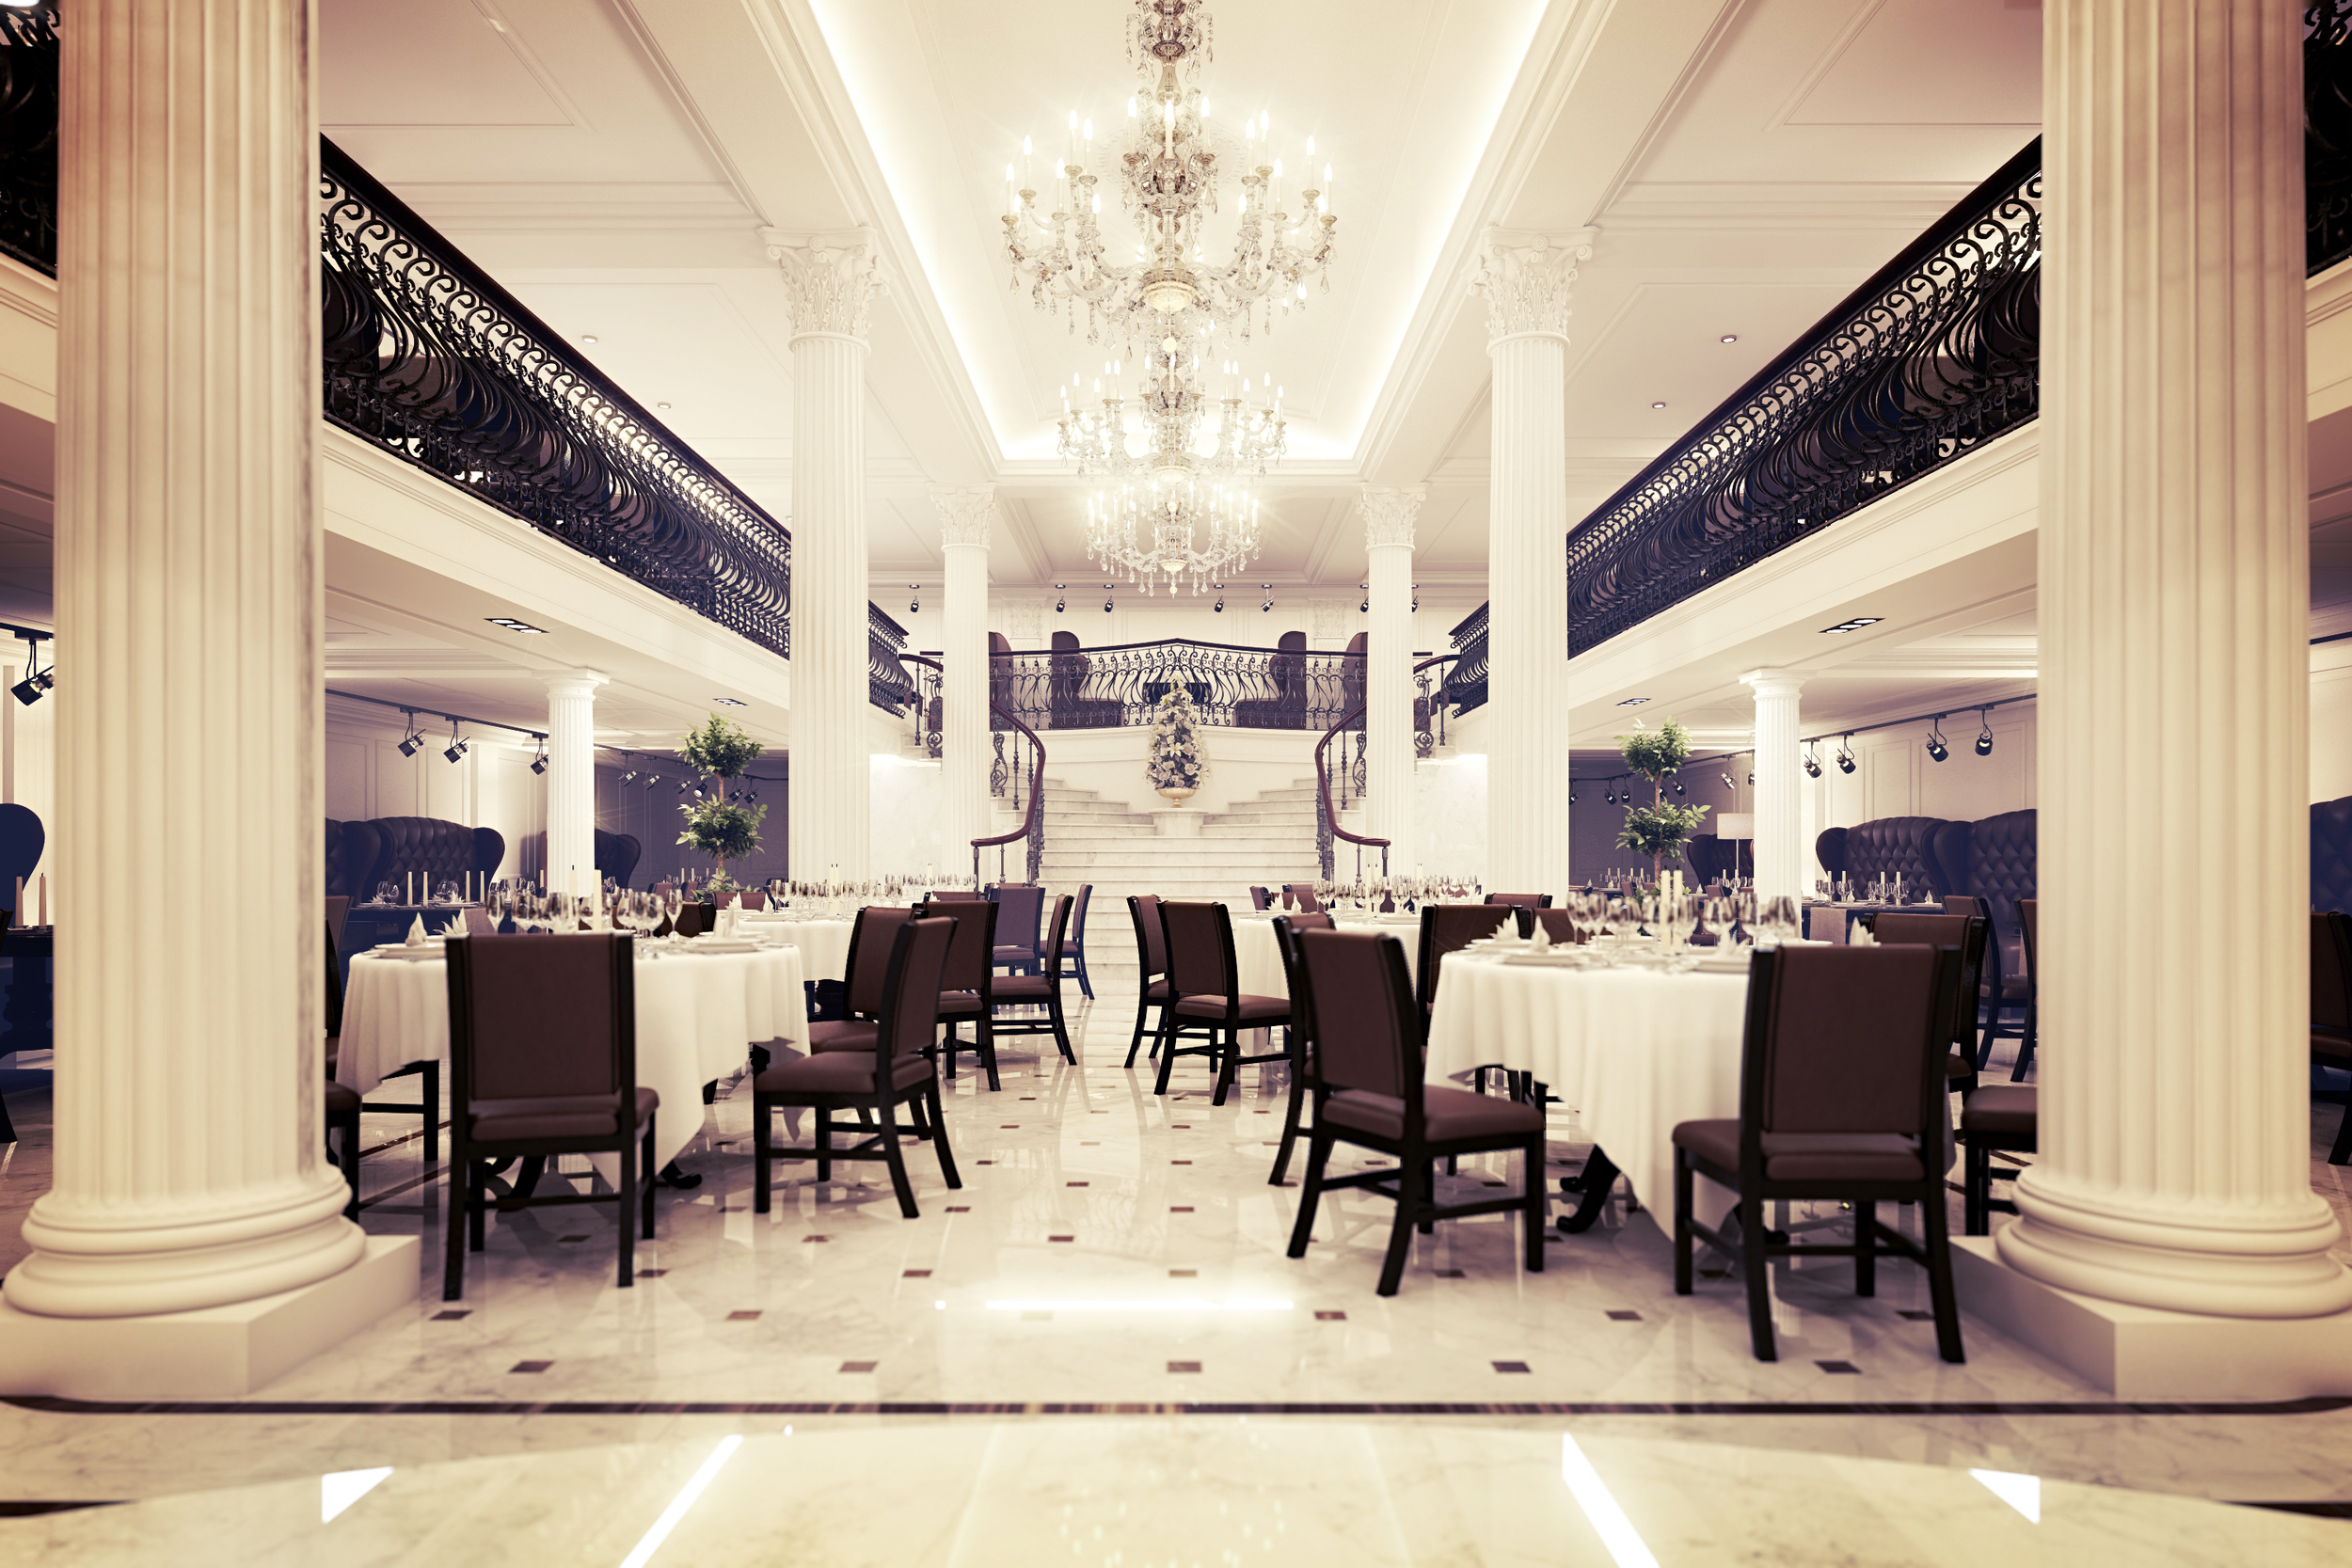 09_Ресторан БЛубянка.jpg